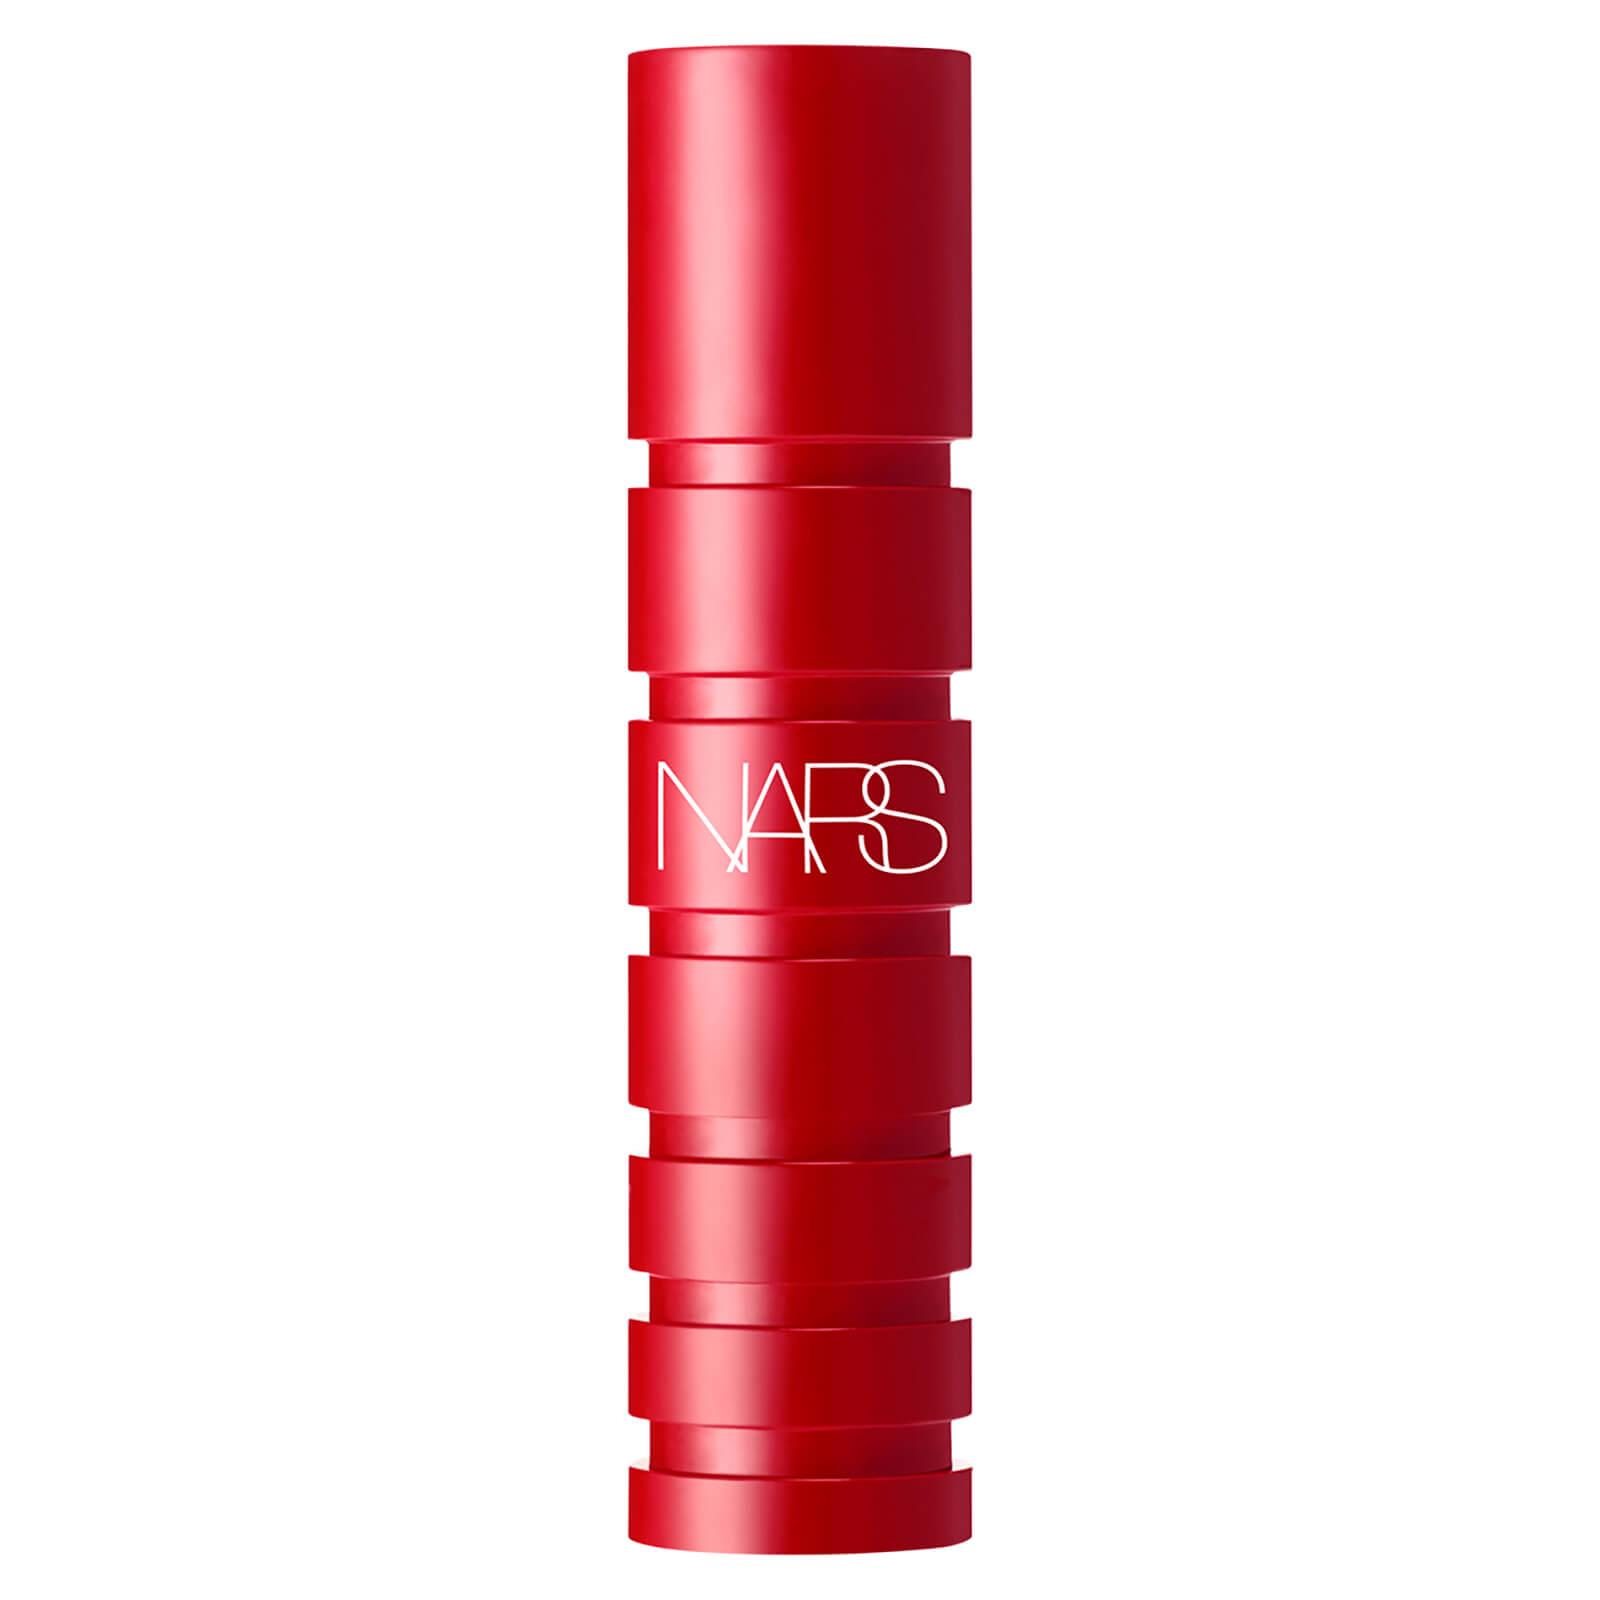 NARS Cosmetics Climax Mini Mascara - Explicit Black 2.5g